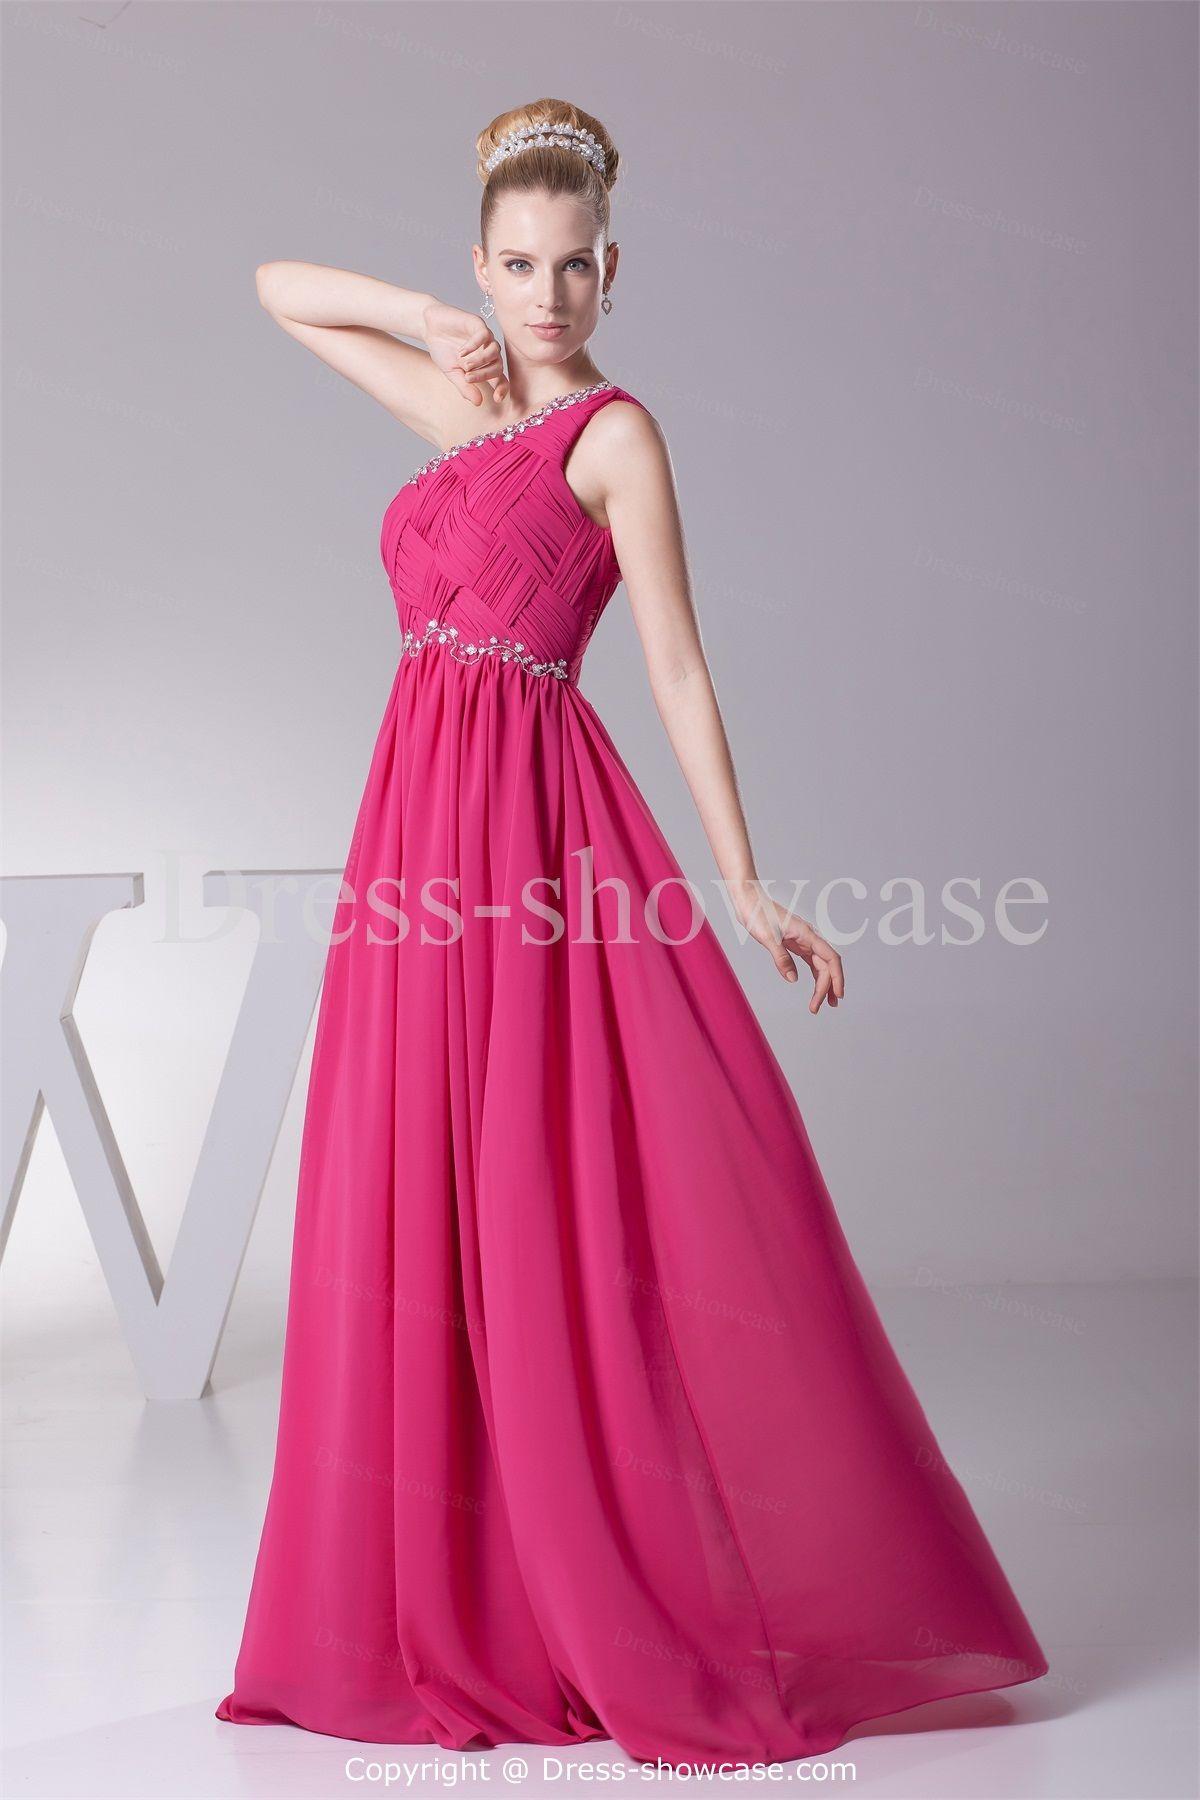 Beading One Shoulder Wedding Guest Dress | Wedding guest dresses ...